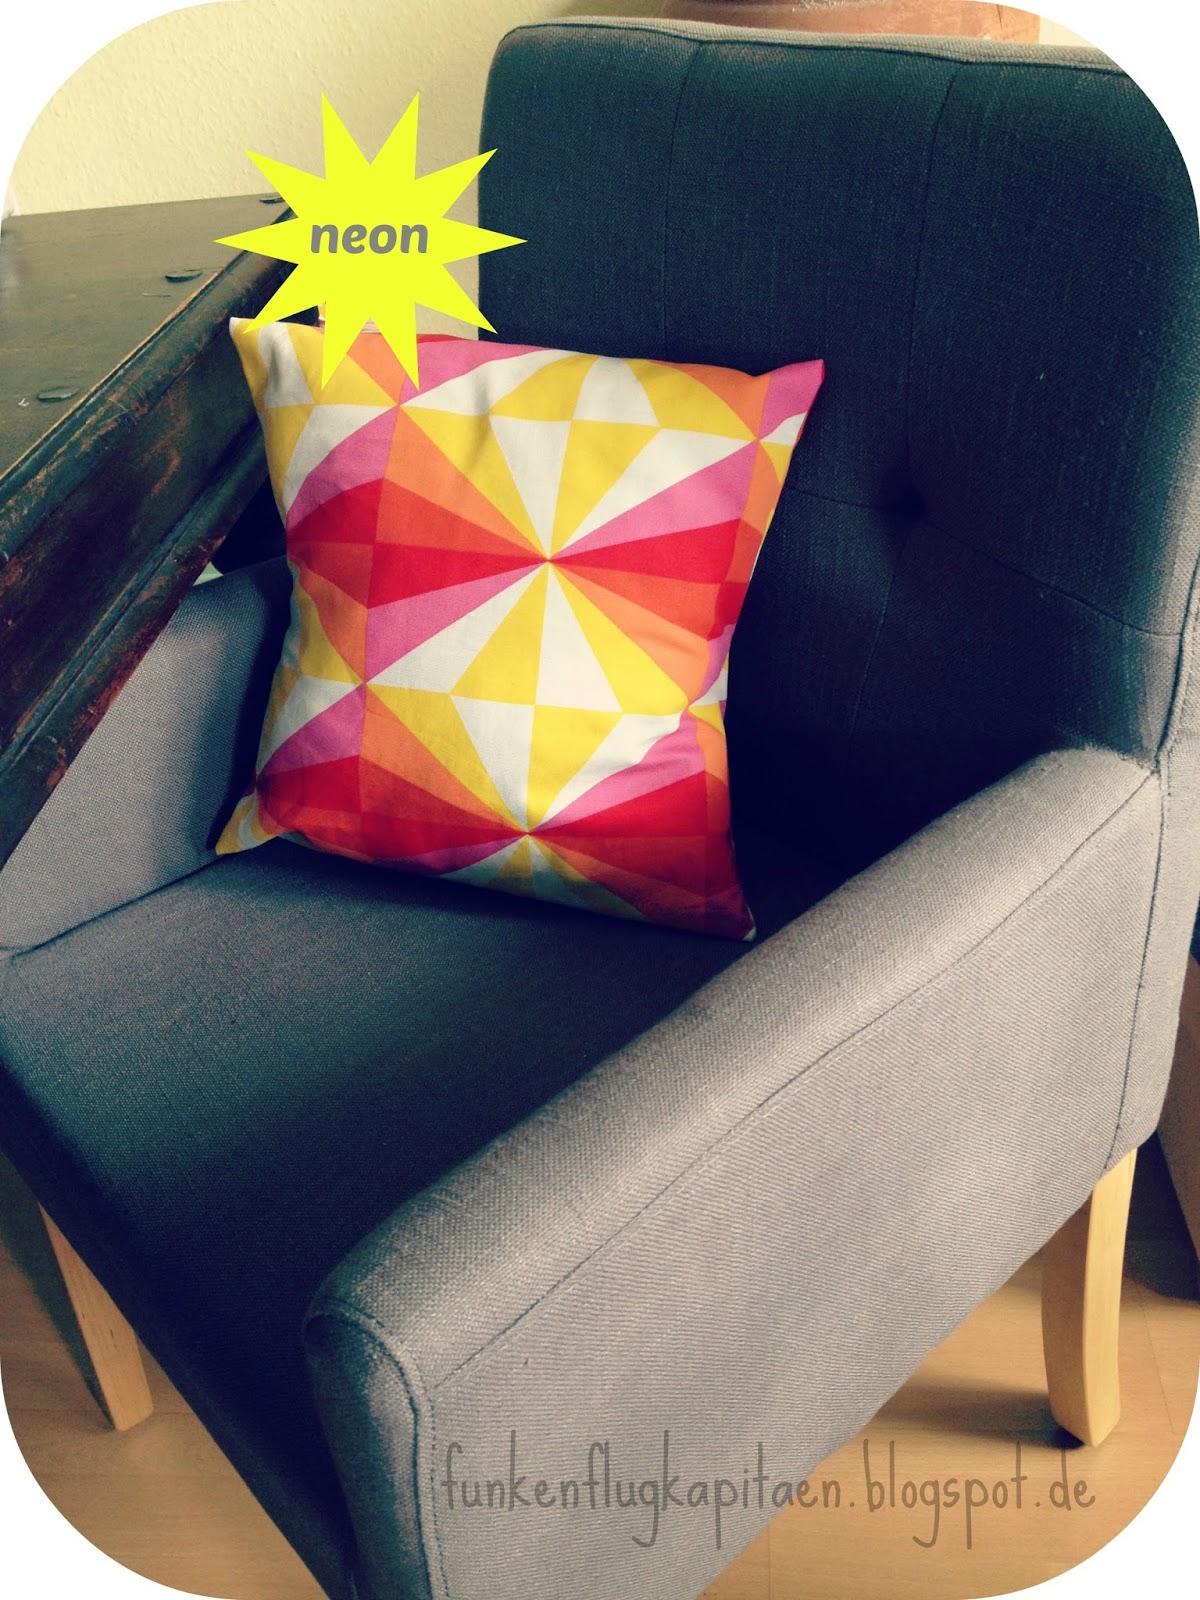 funkenflugkapit n geometrisches muster auf der kissenh lle aus baumwolle. Black Bedroom Furniture Sets. Home Design Ideas